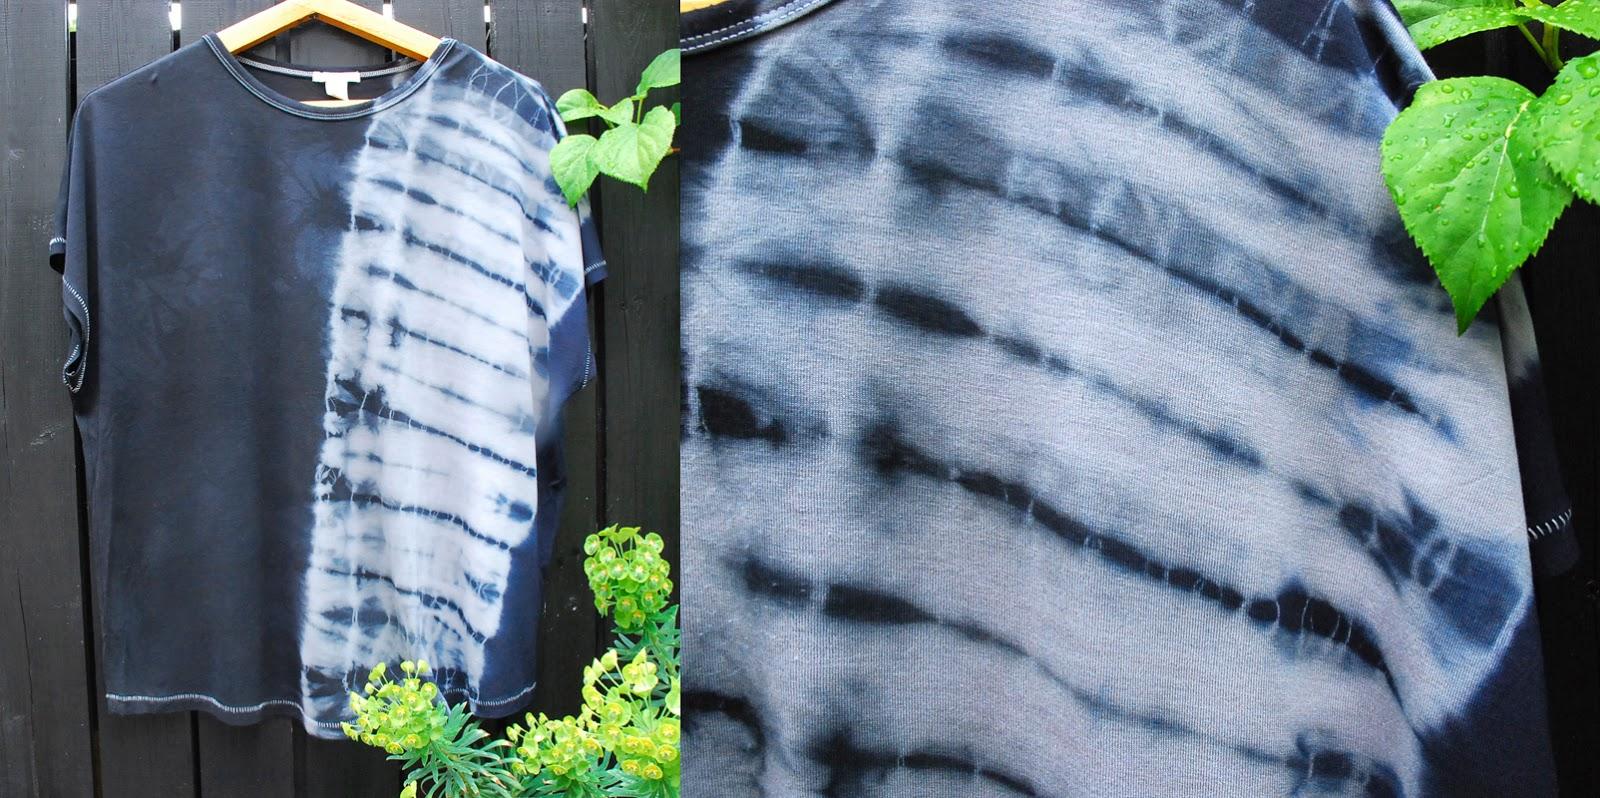 rot-gelb-blau.blog: neue färbung in shibori technik